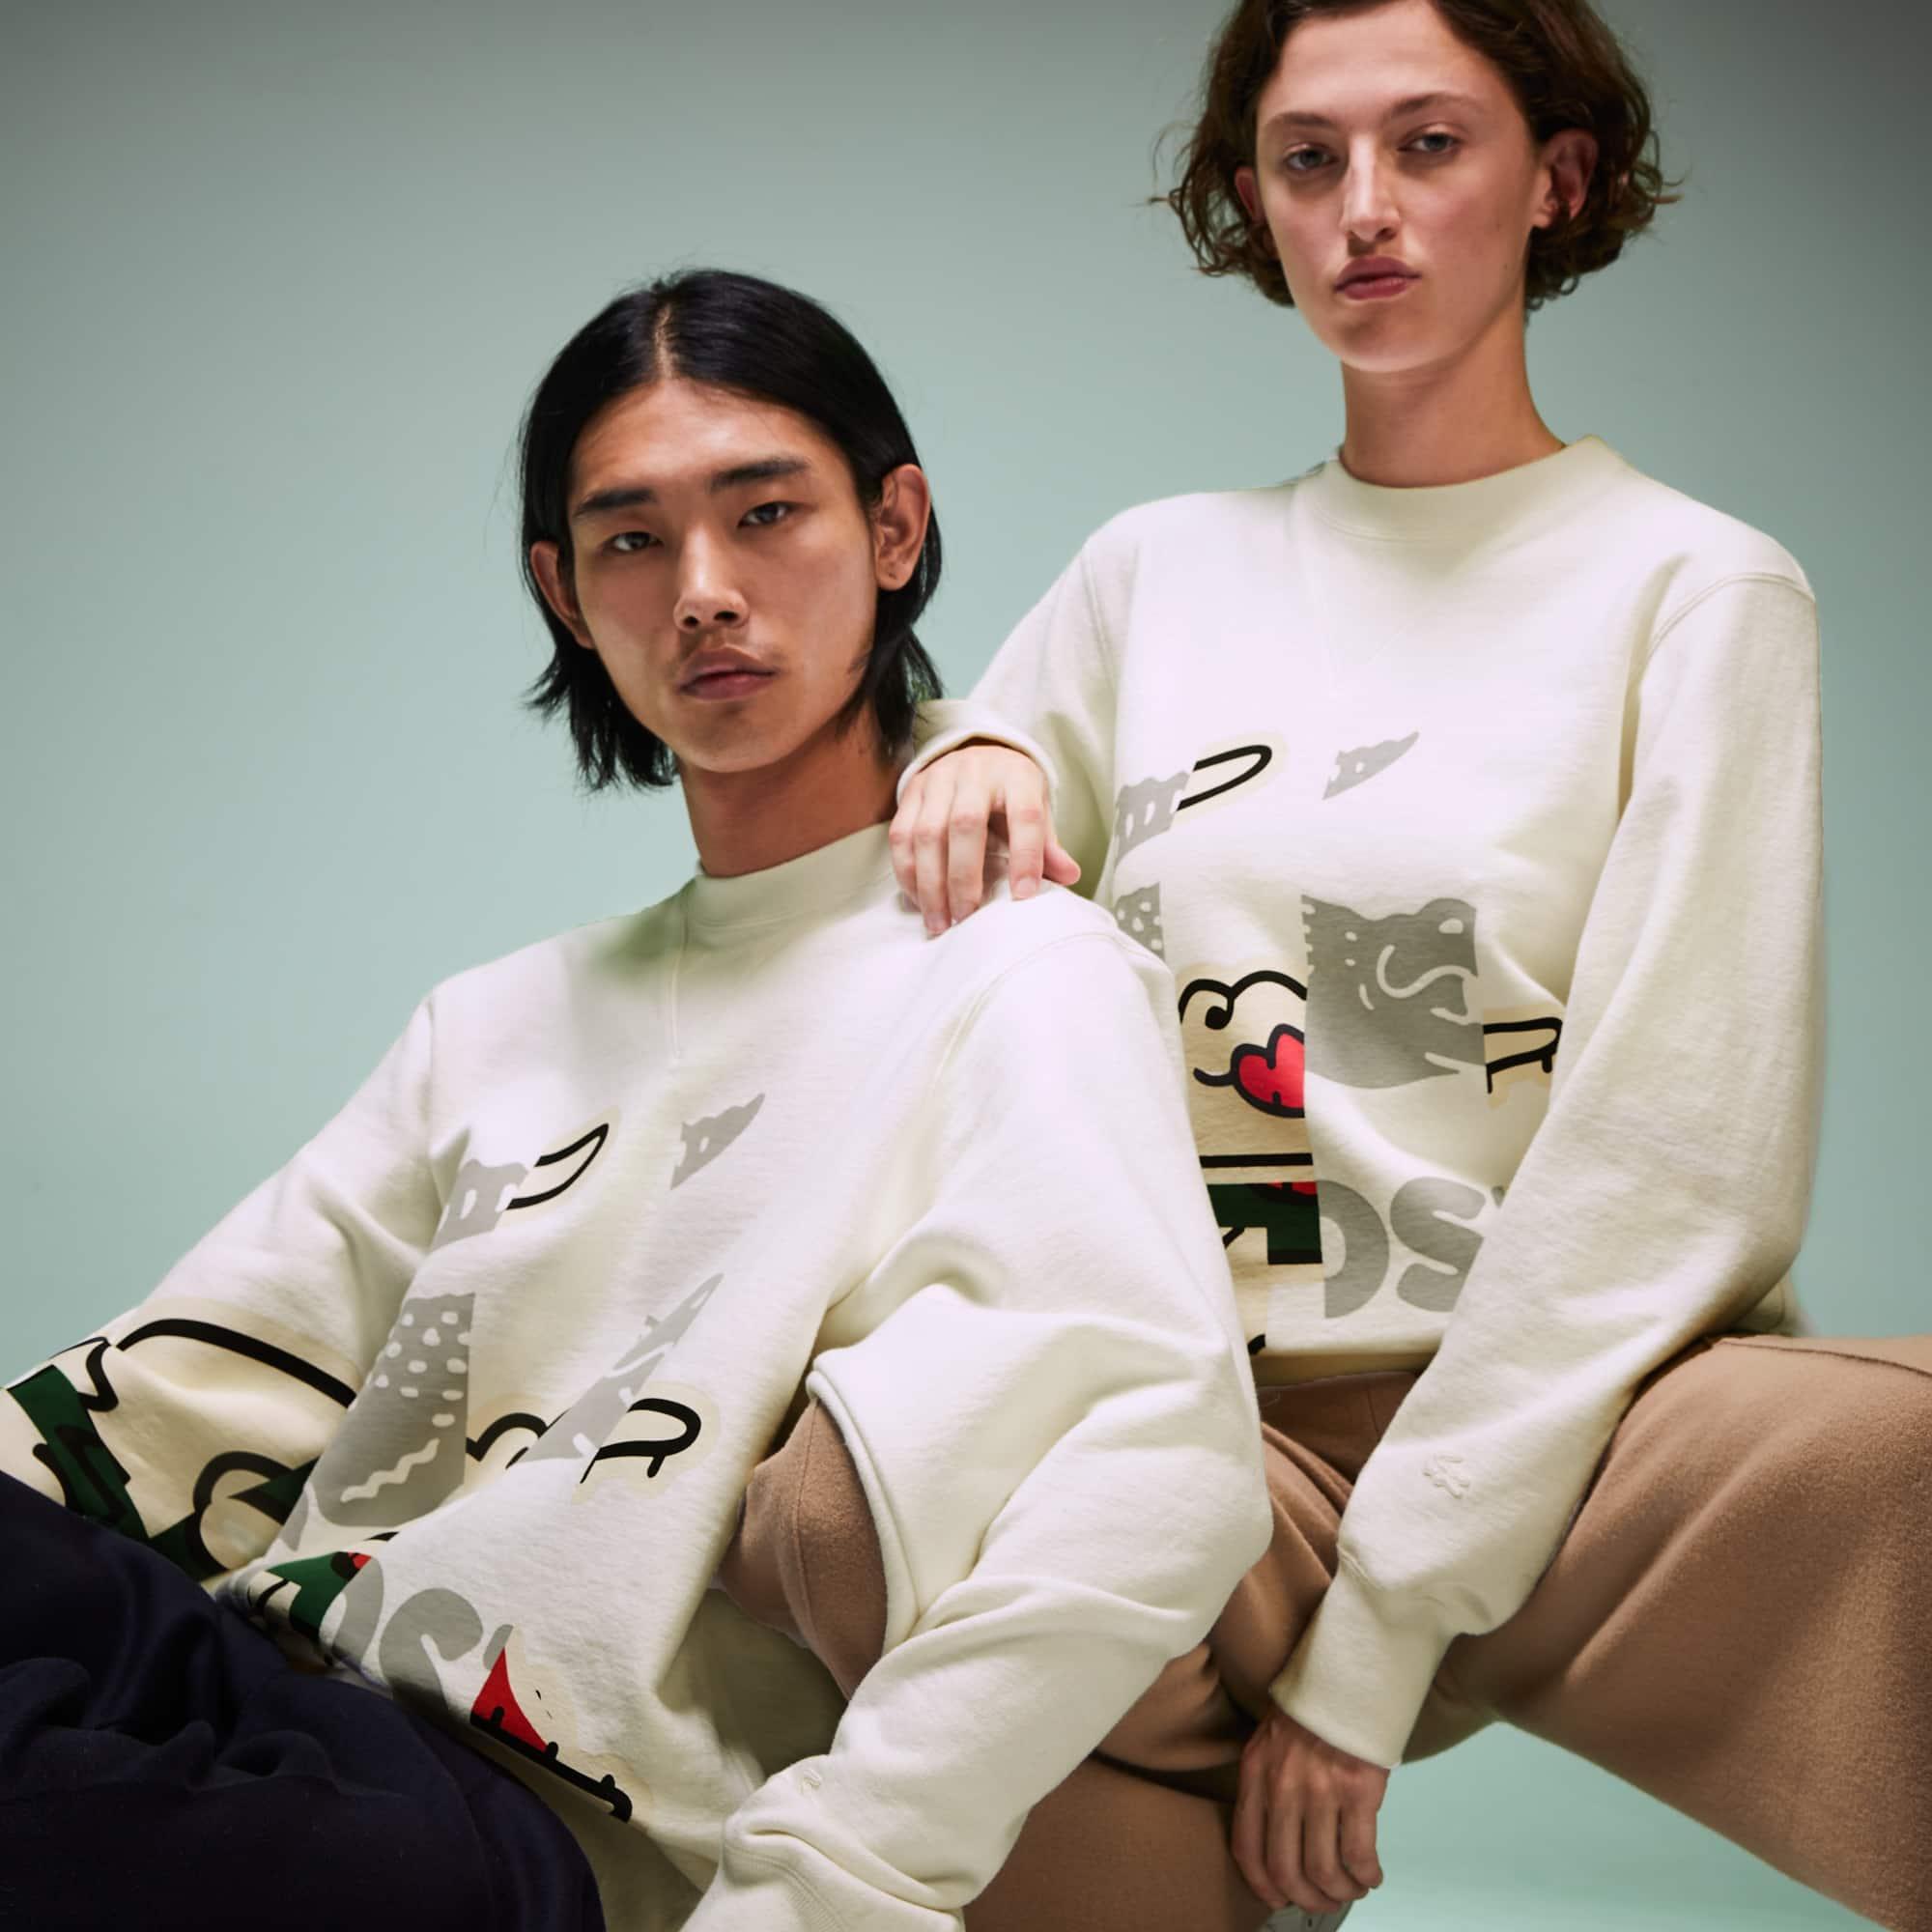 Lacoste Tops Unisex Fashion Show Crocodile Printed Sweatshirt